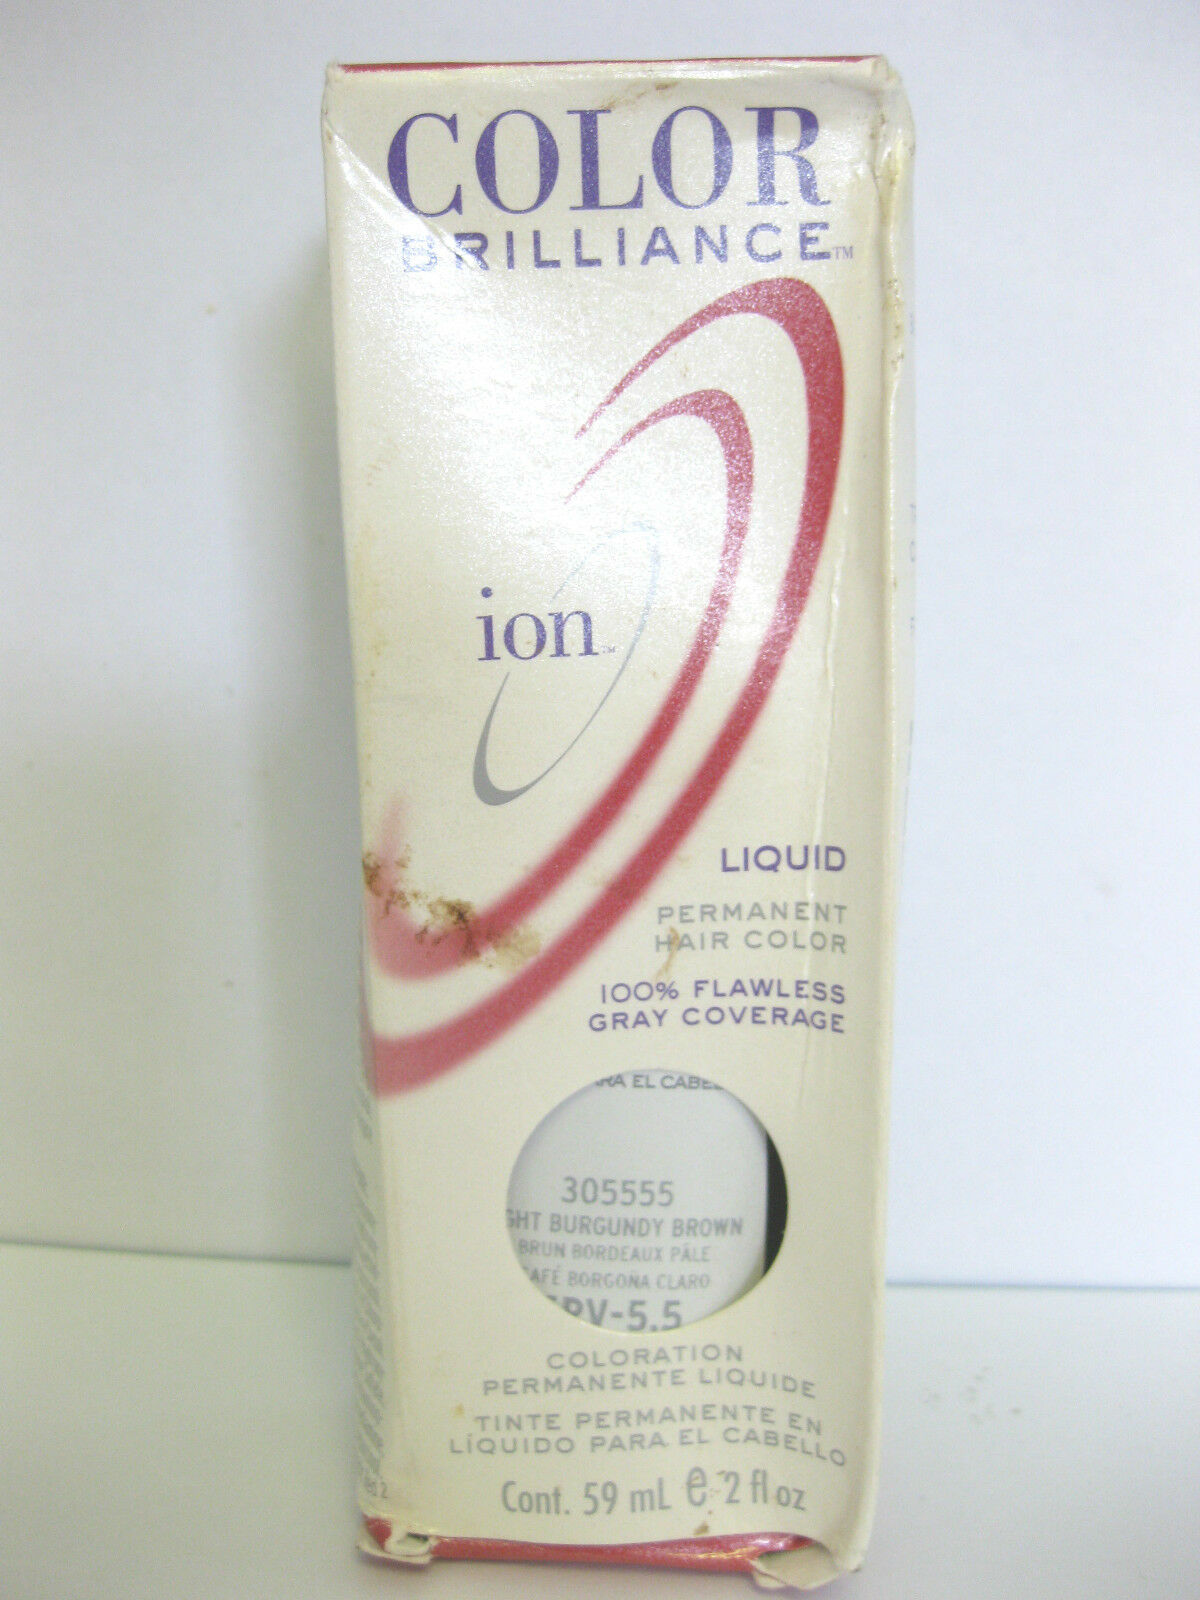 Ion Color Brilliance Liquid Permanent Hair Color 2 Oz